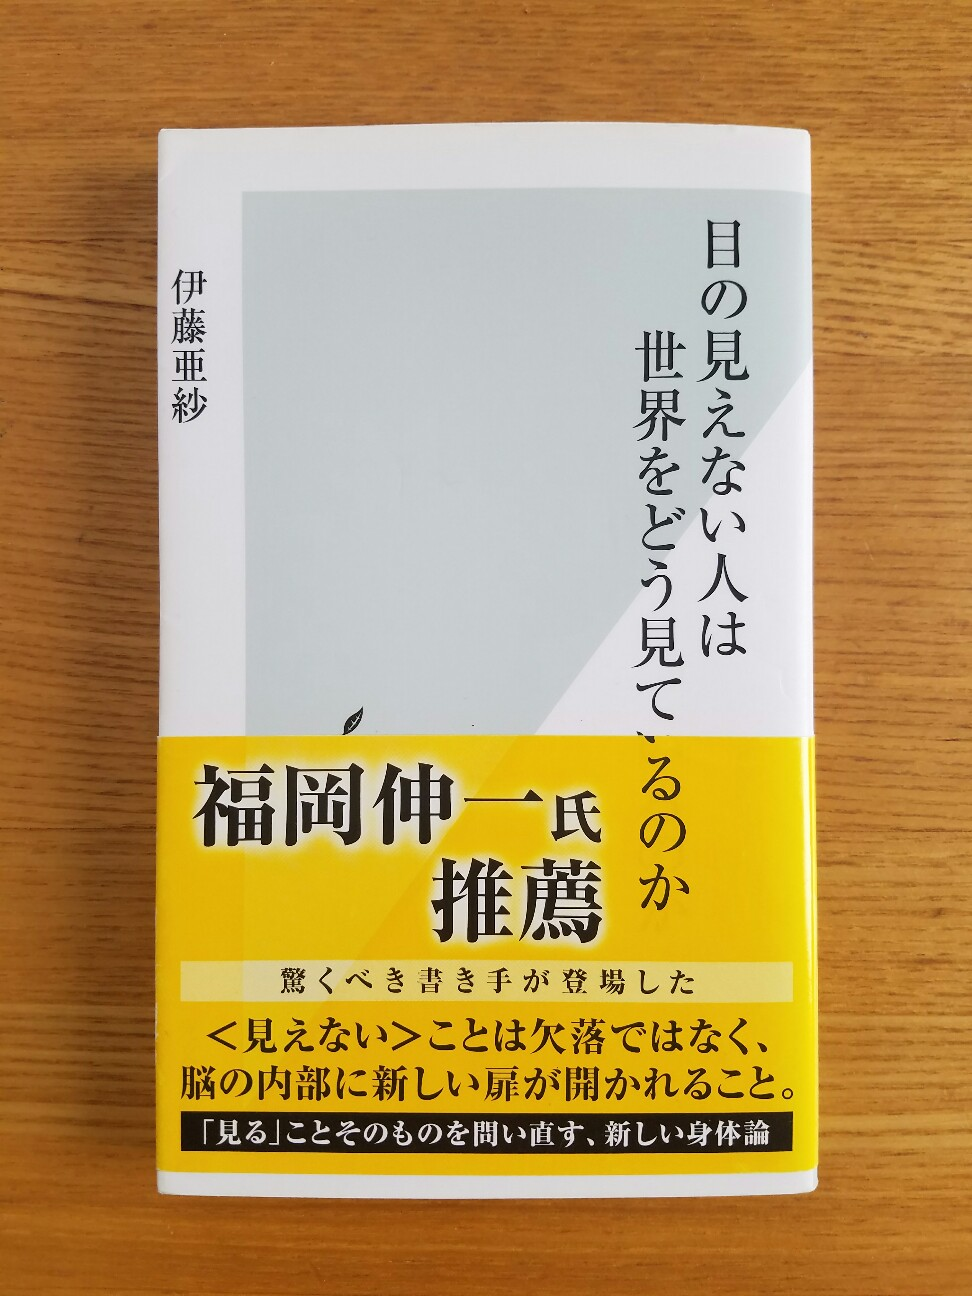 f:id:hitotobi:20190725125232j:image